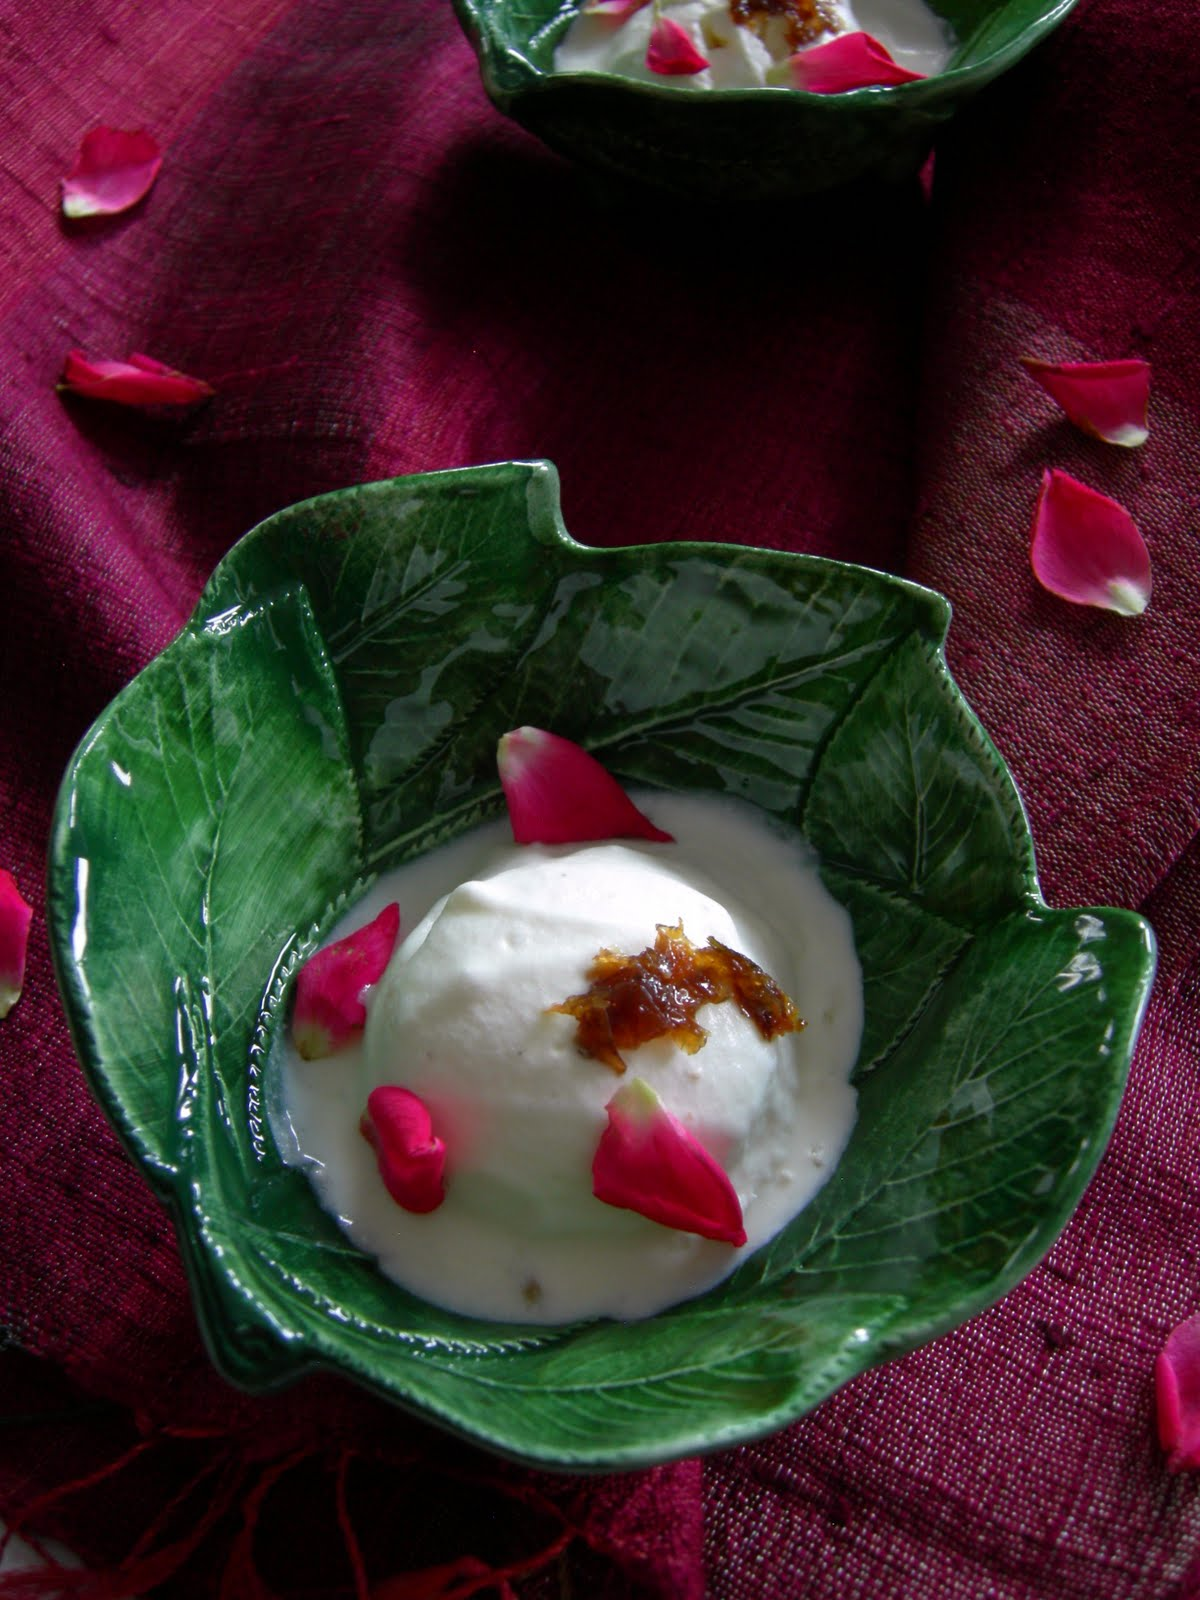 Gulkand Elaichi Ice Cream / Rose-Petal preserve and Cardamom Ice Cream ...